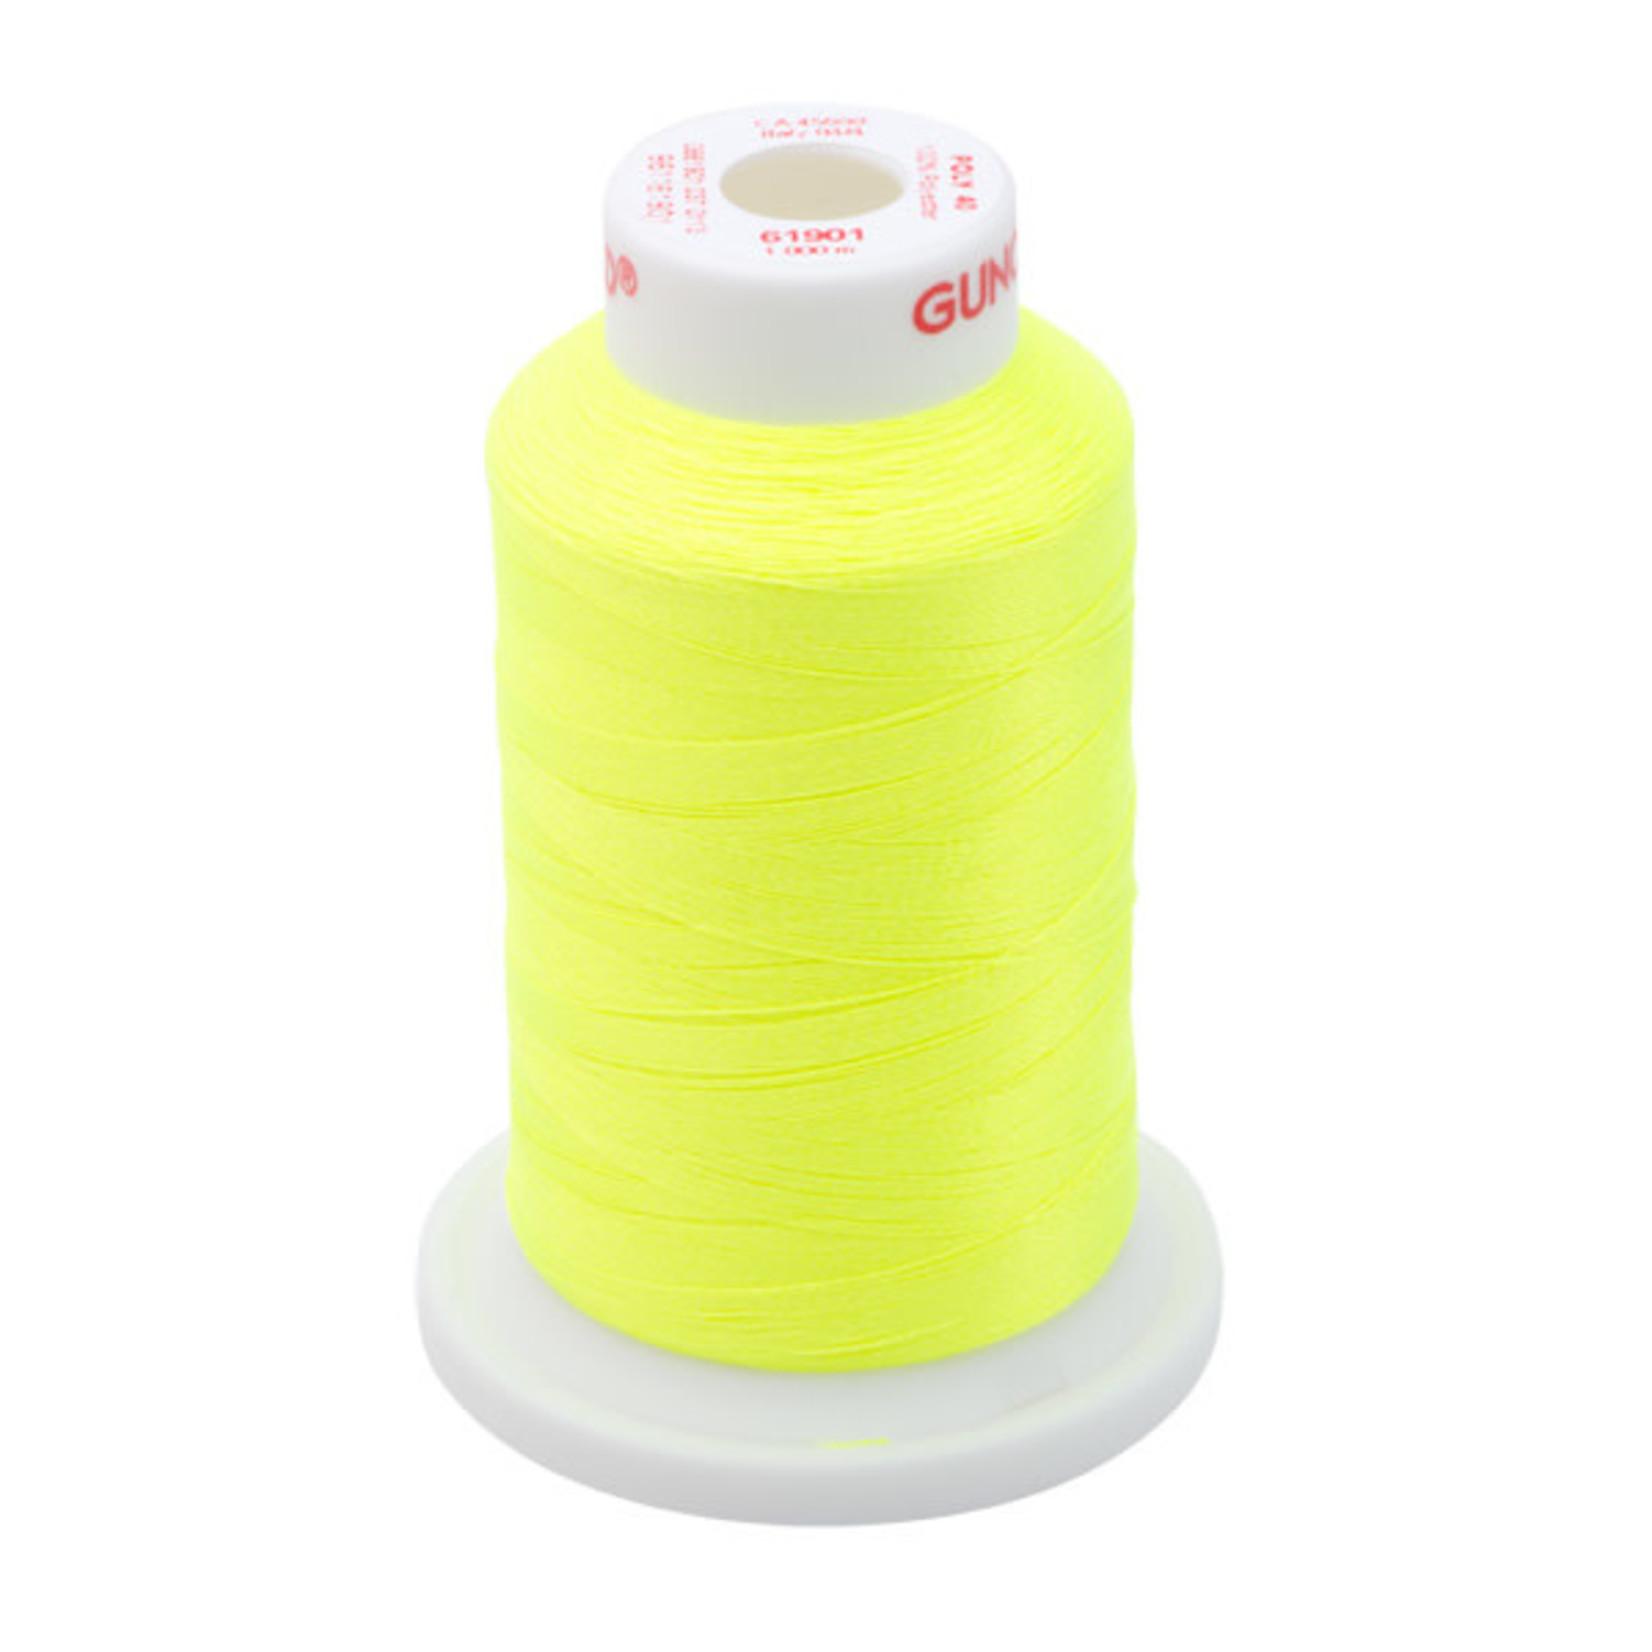 Gunold Poly 40 WT 61901 Neon Yellow 1000m